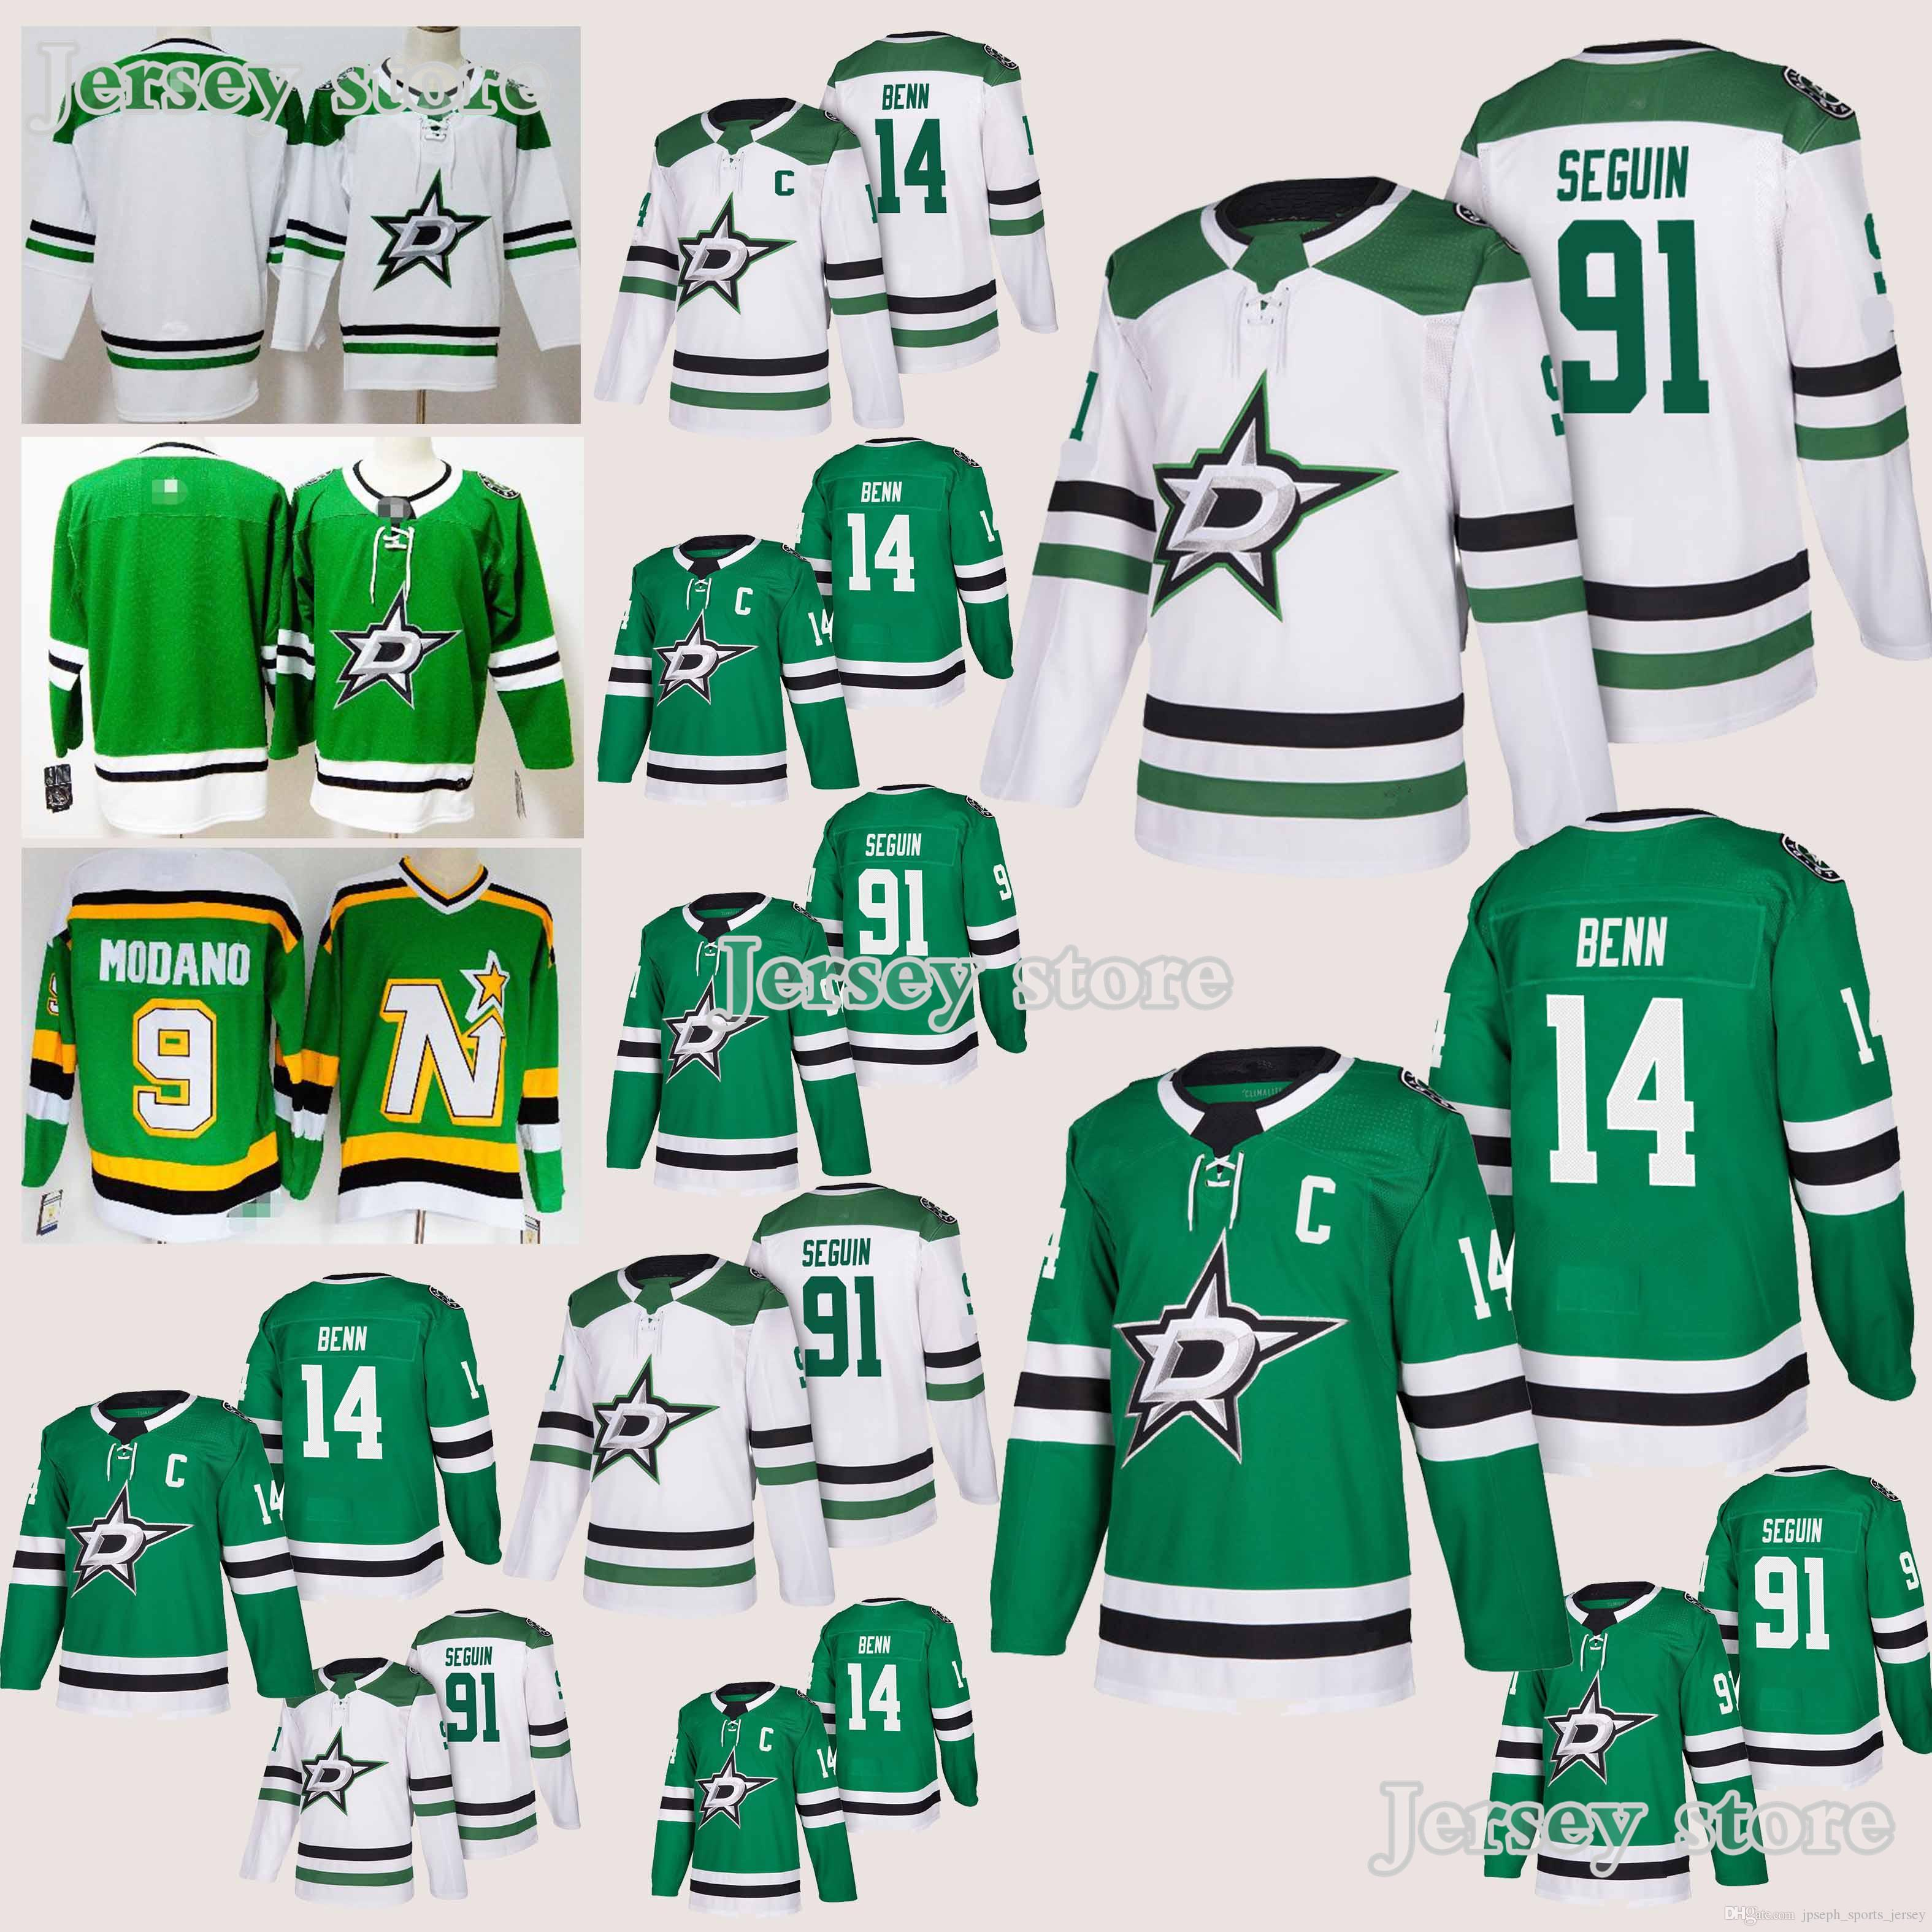 2019 Dallas Stars Jerseys 91 Tyler Seguin 14 Jamie Benn Hot Sale High  Quality New Hockey Jerseys 18 19 From Jpseph sports jersey 90c82460b